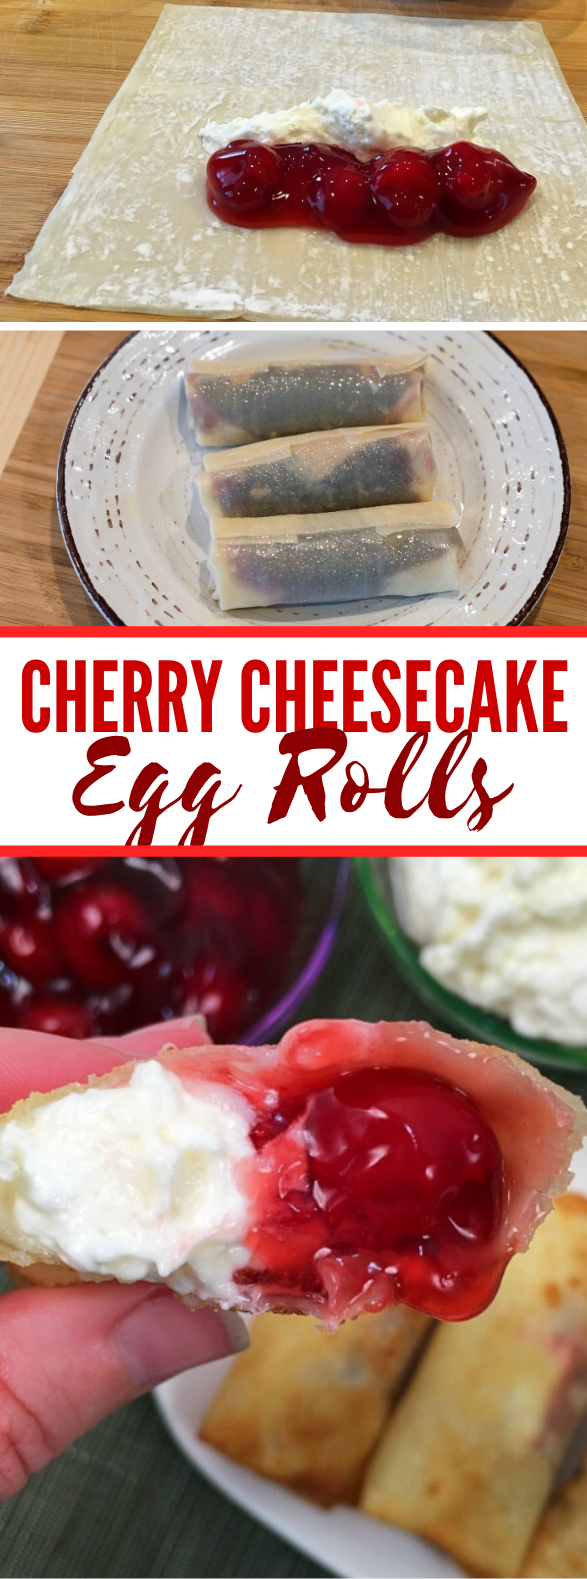 Cherry Cheesecake Egg Rolls #desserts #cake